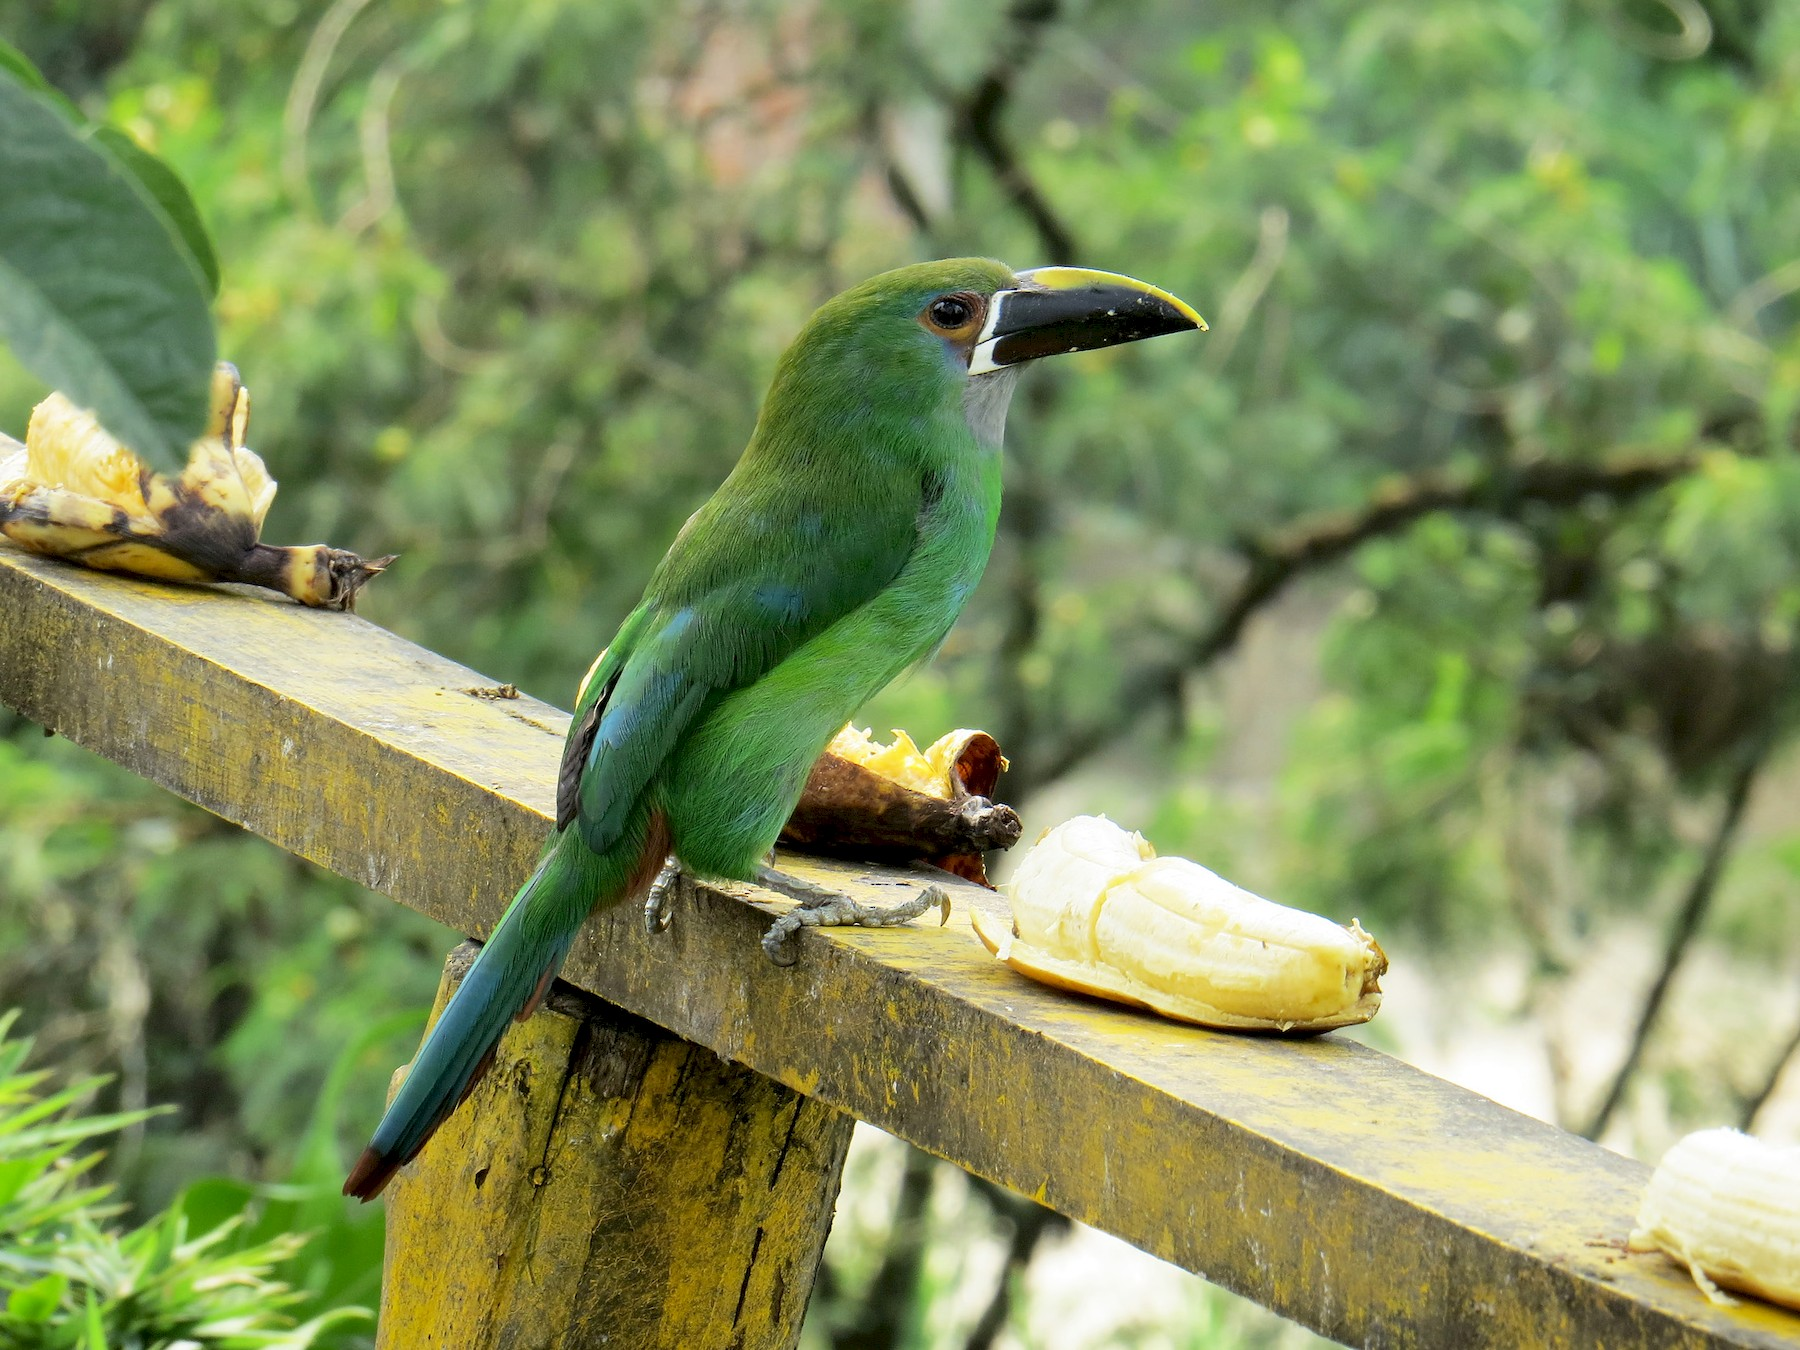 Southern Emerald-Toucanet - Kevin Groeneweg